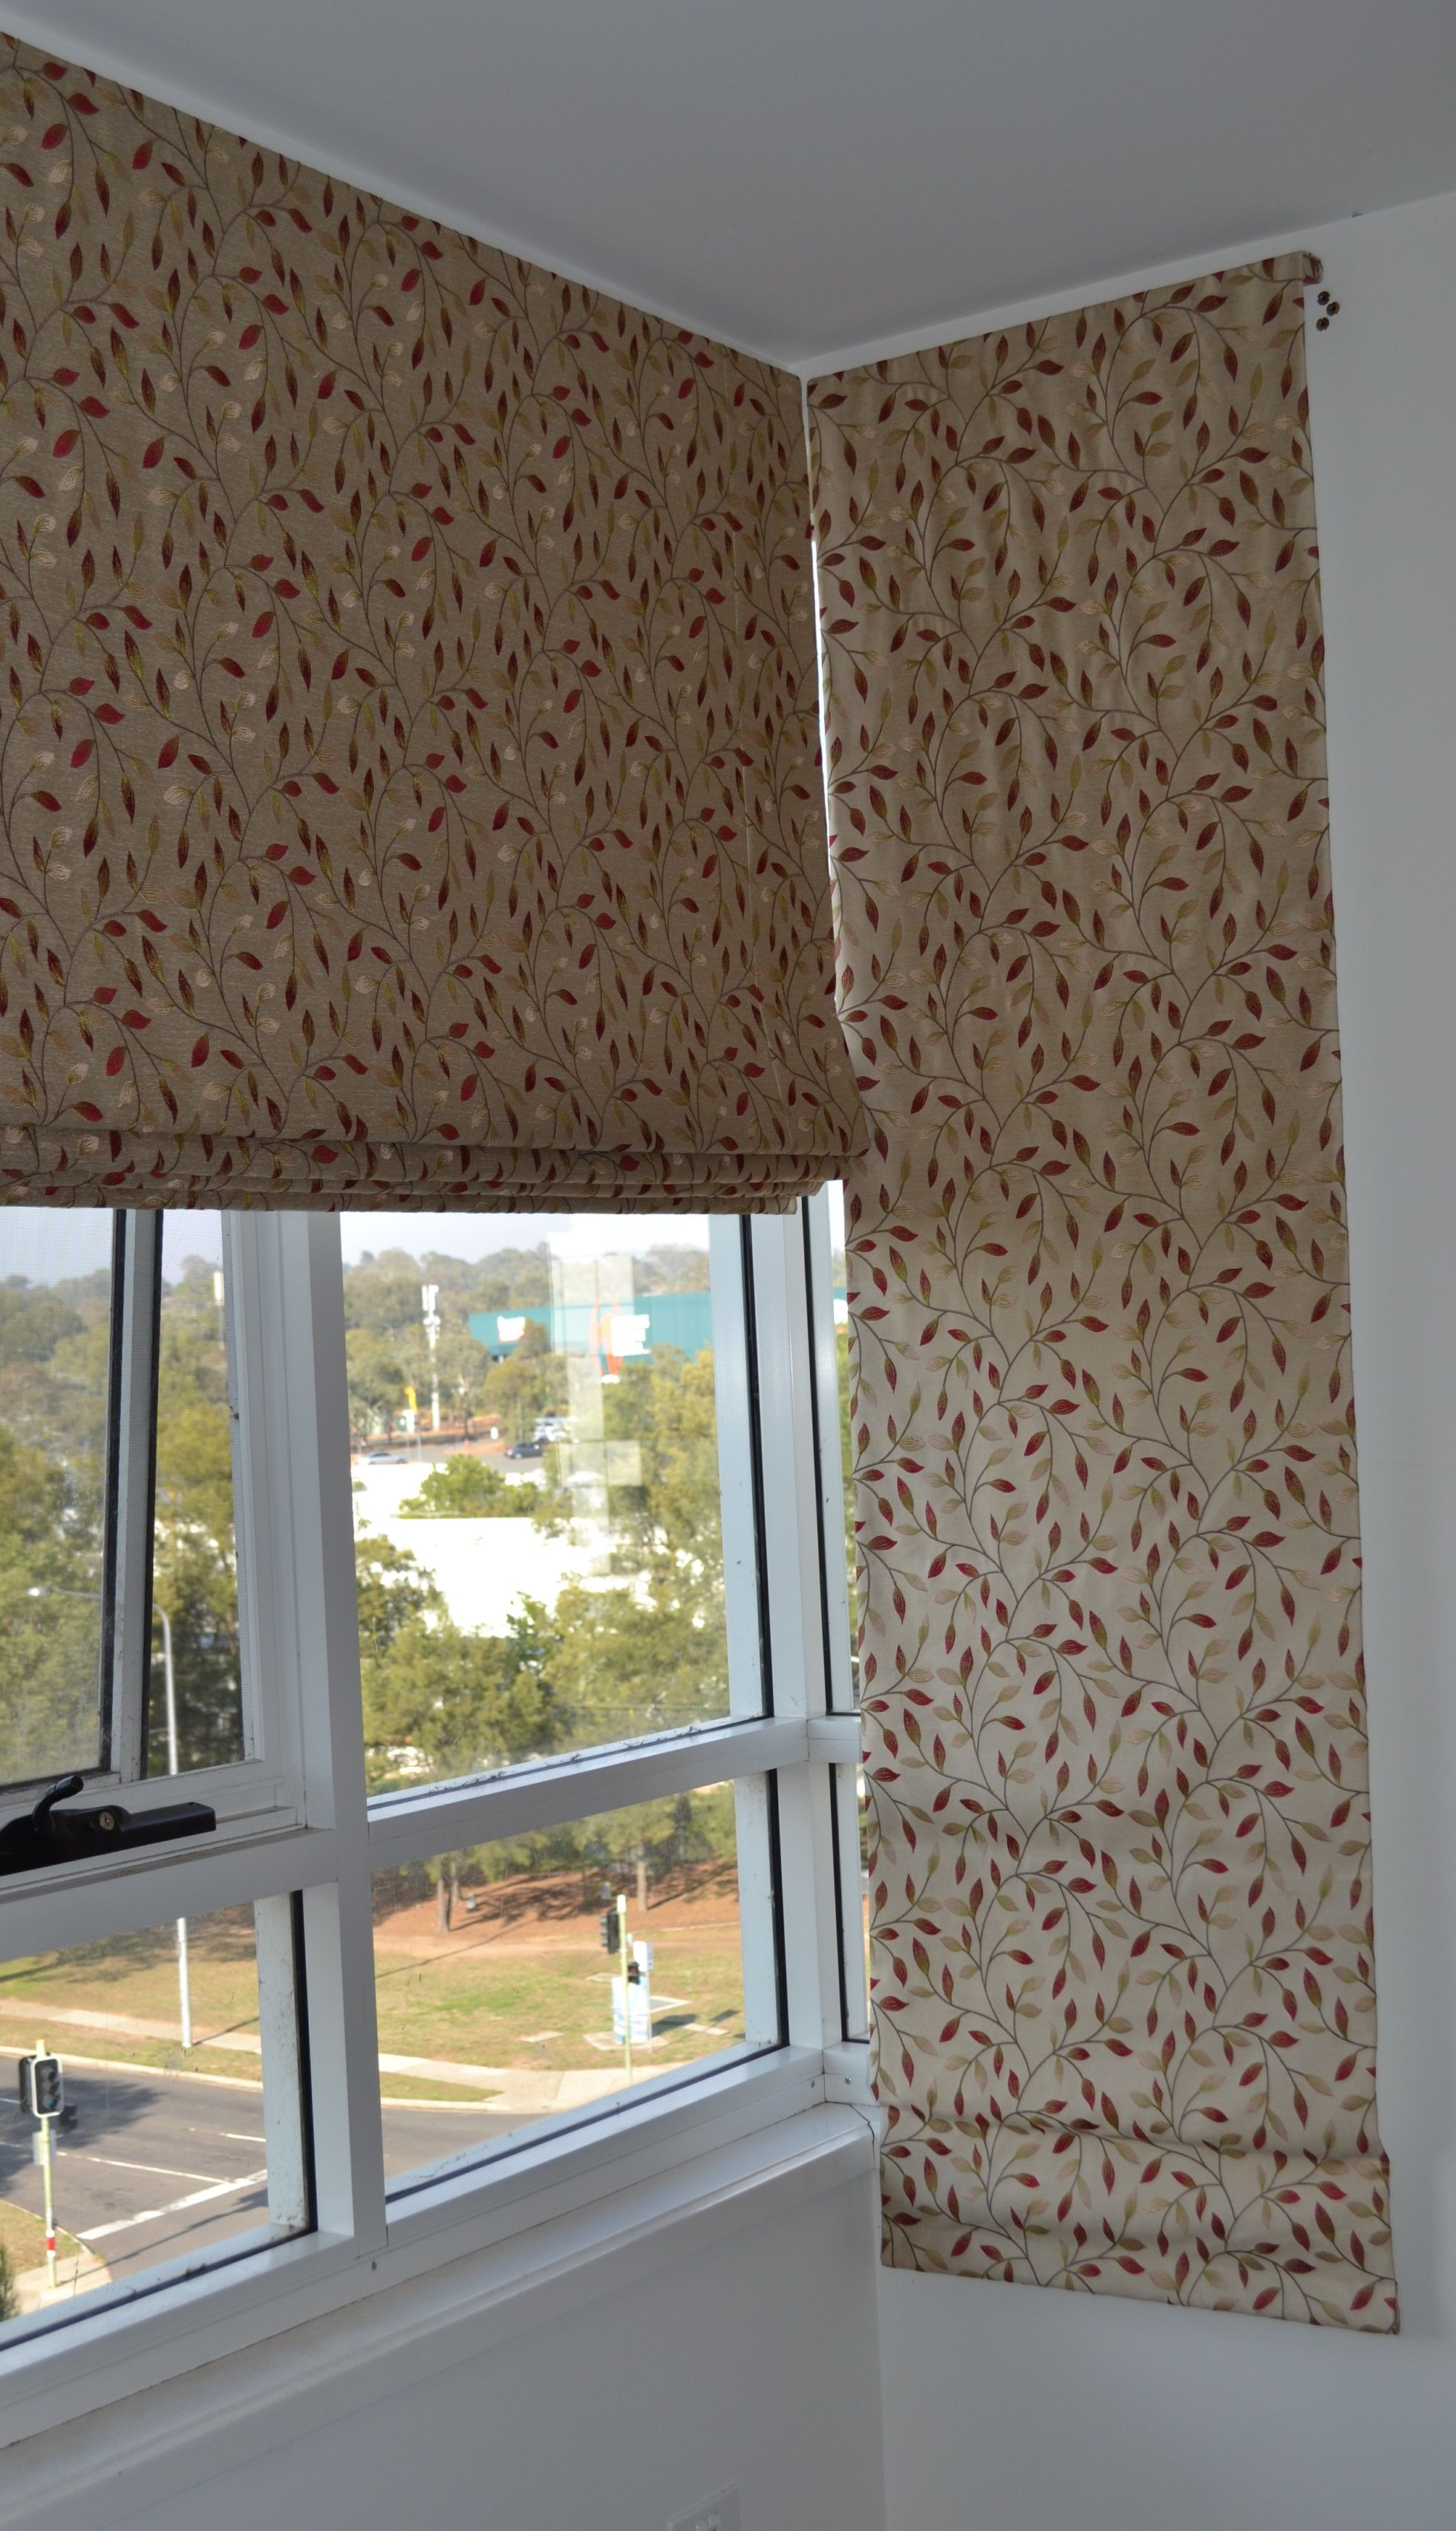 roman blind can be suitable for corner windows roman blinds pinterest. Black Bedroom Furniture Sets. Home Design Ideas